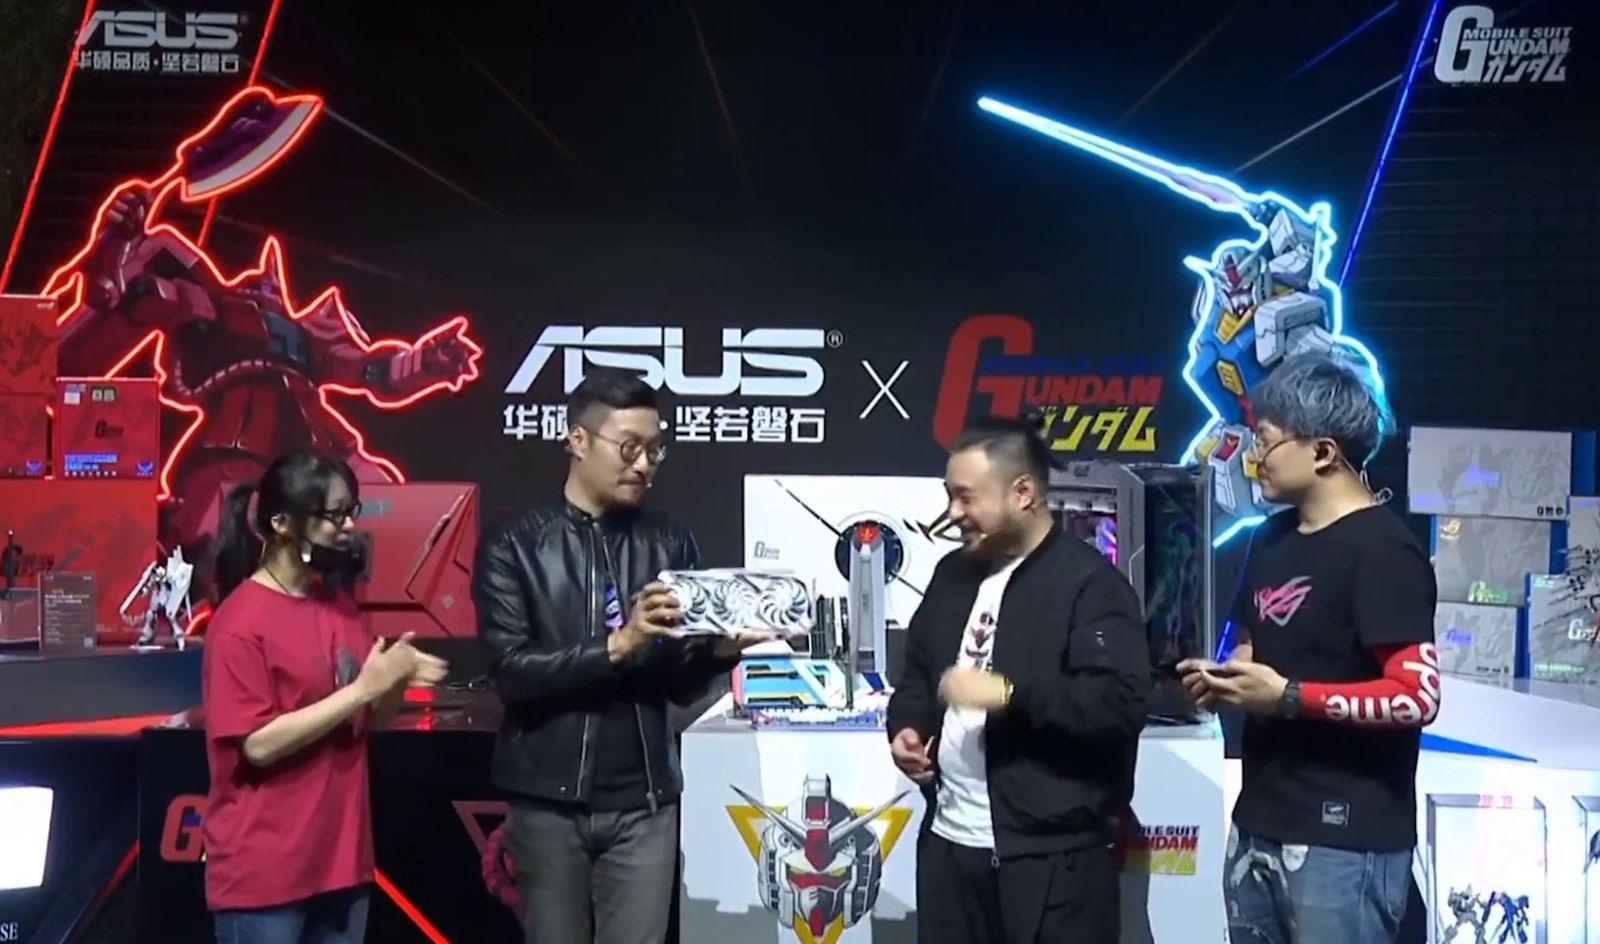 Présentation de la Rog Strix Gundam RTX 3090 au Rog Day 2020